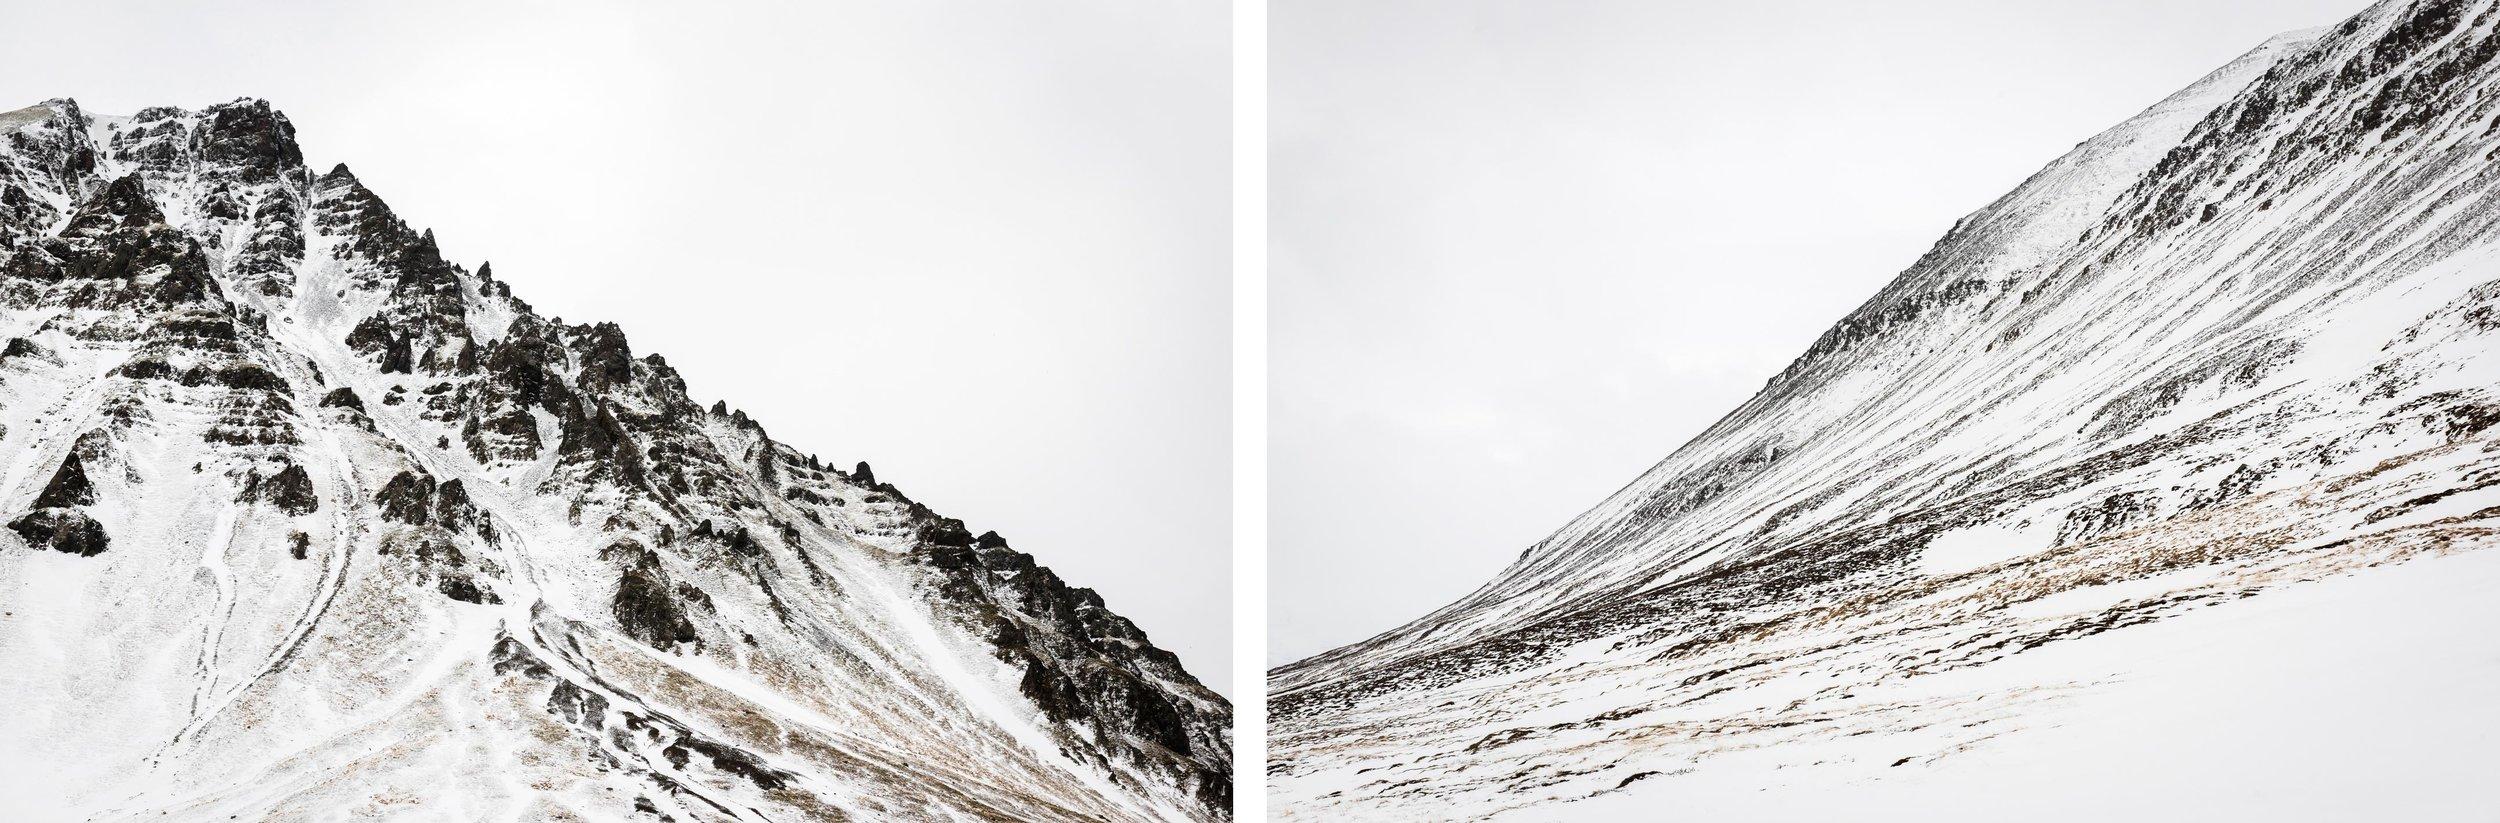 Voyage_Islande_Hiver_Anouk-Ruffieux_03.jpg